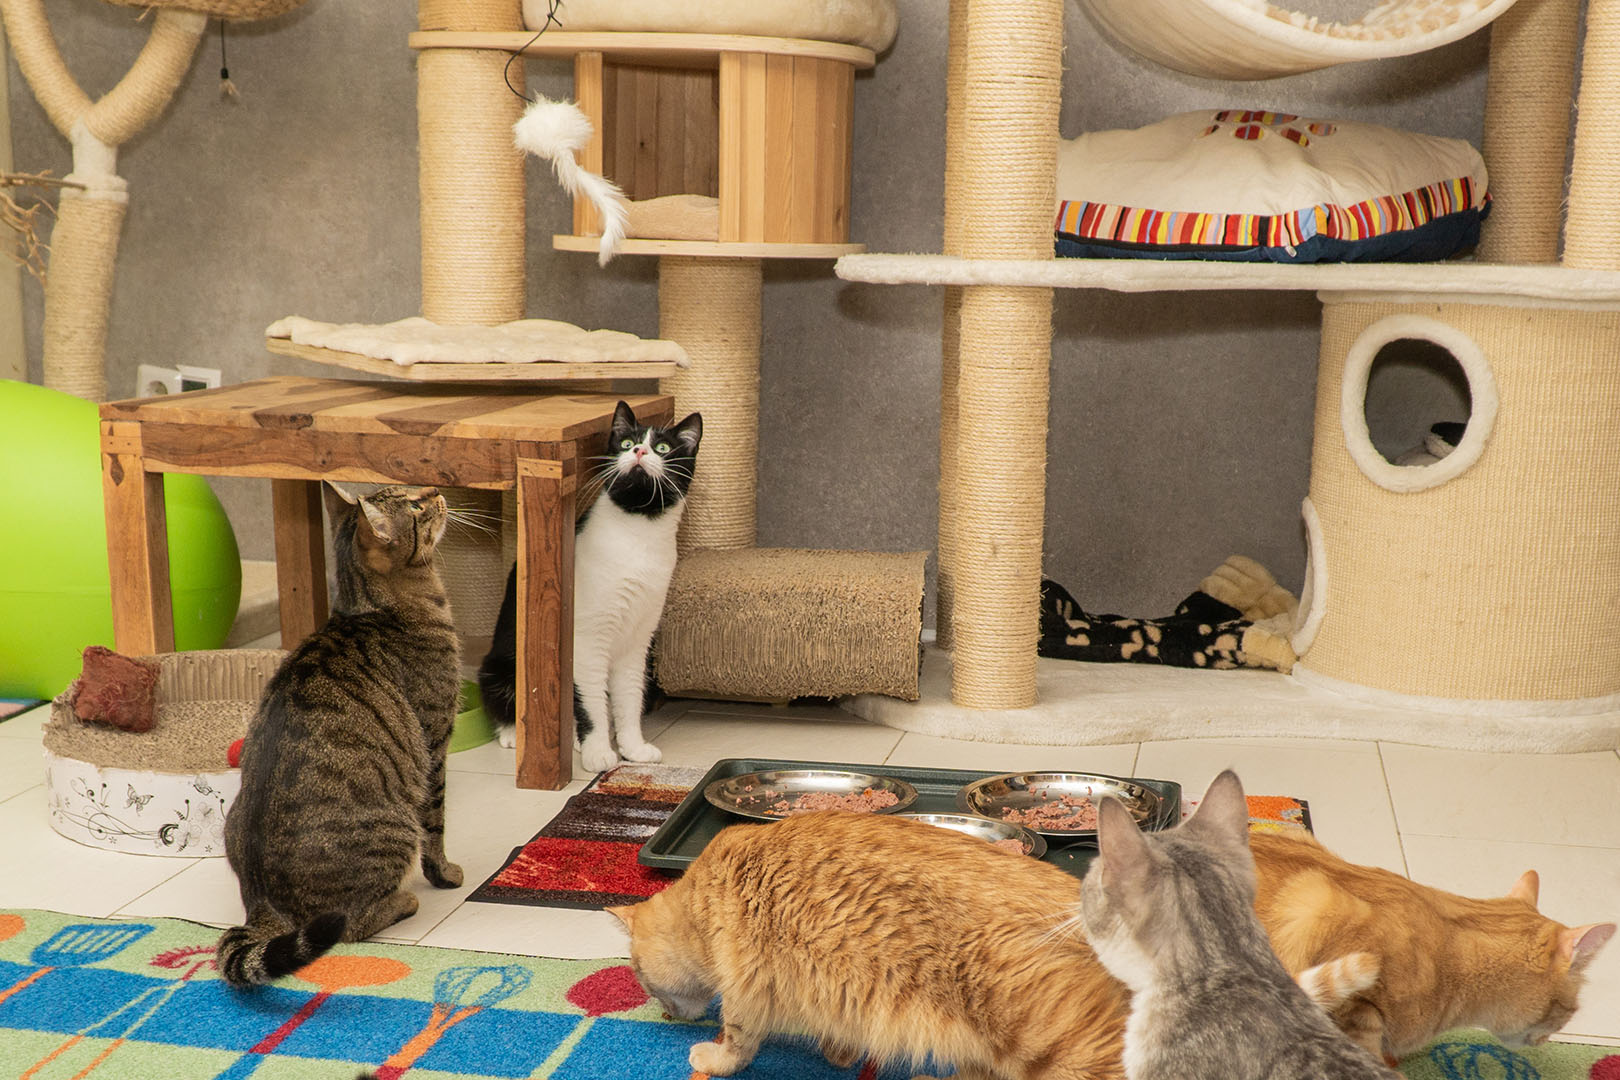 Pflegekatzen Startseite 30.10.18 (9)